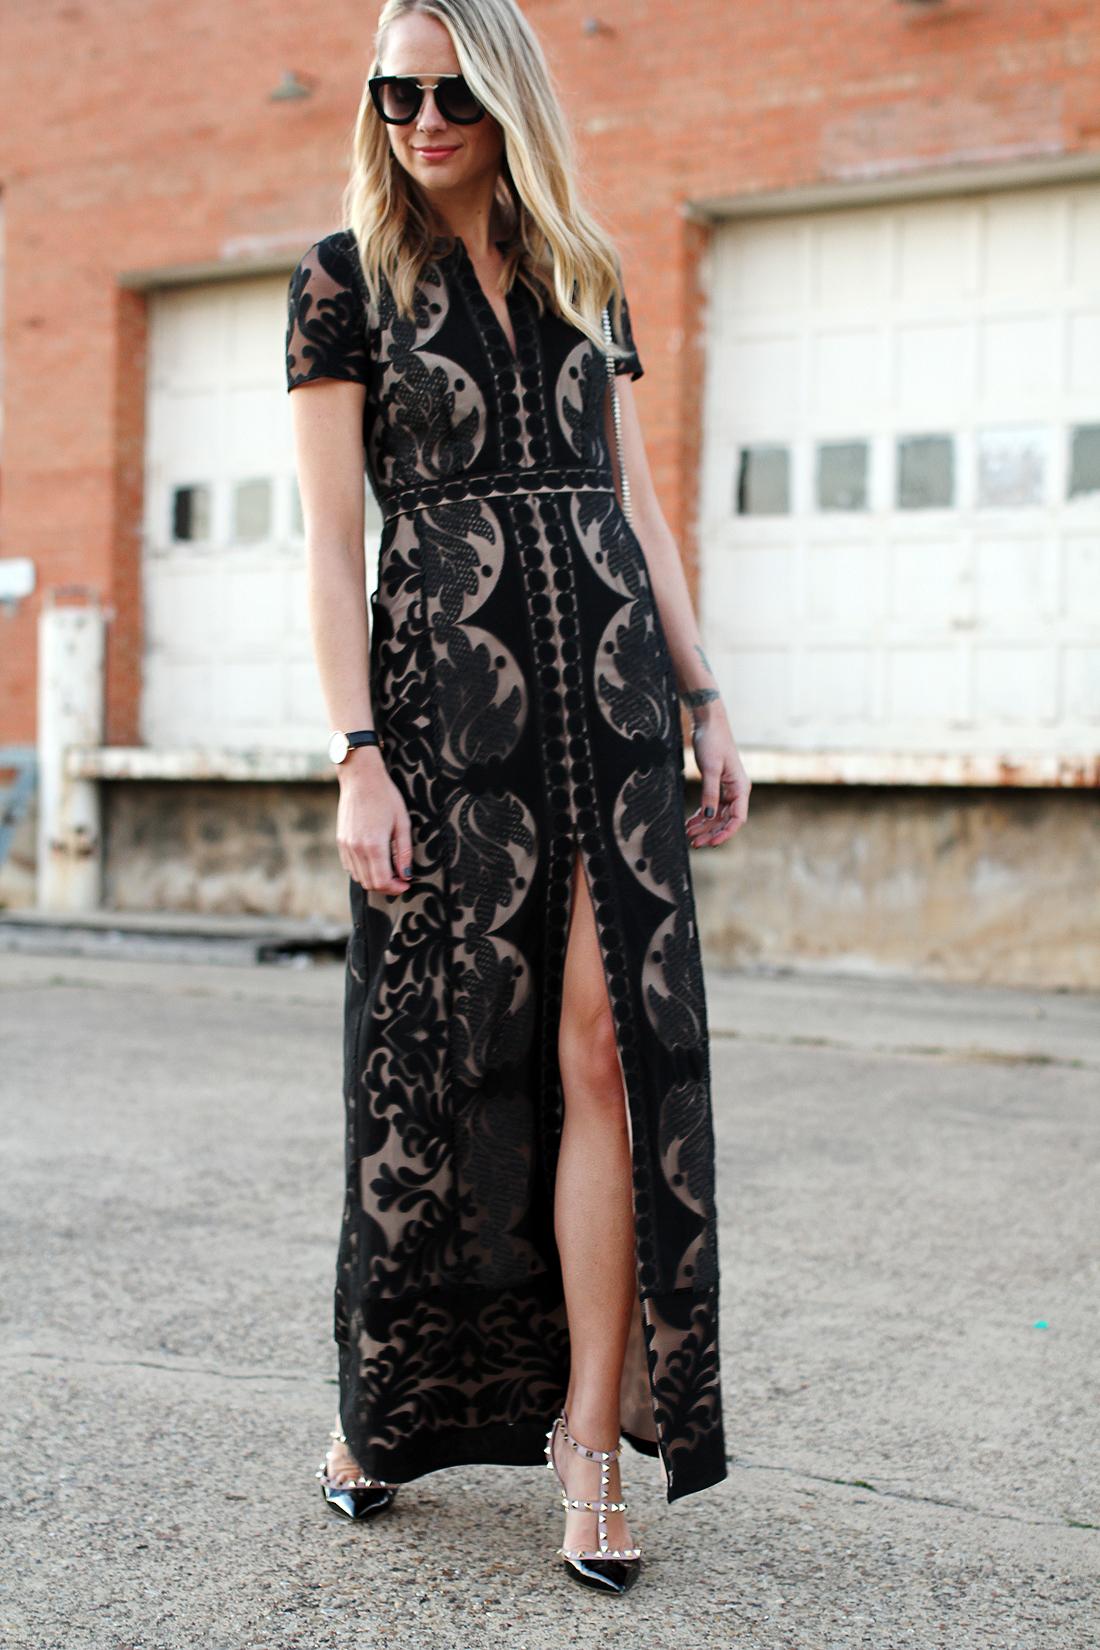 Prada lace dress 2018 short